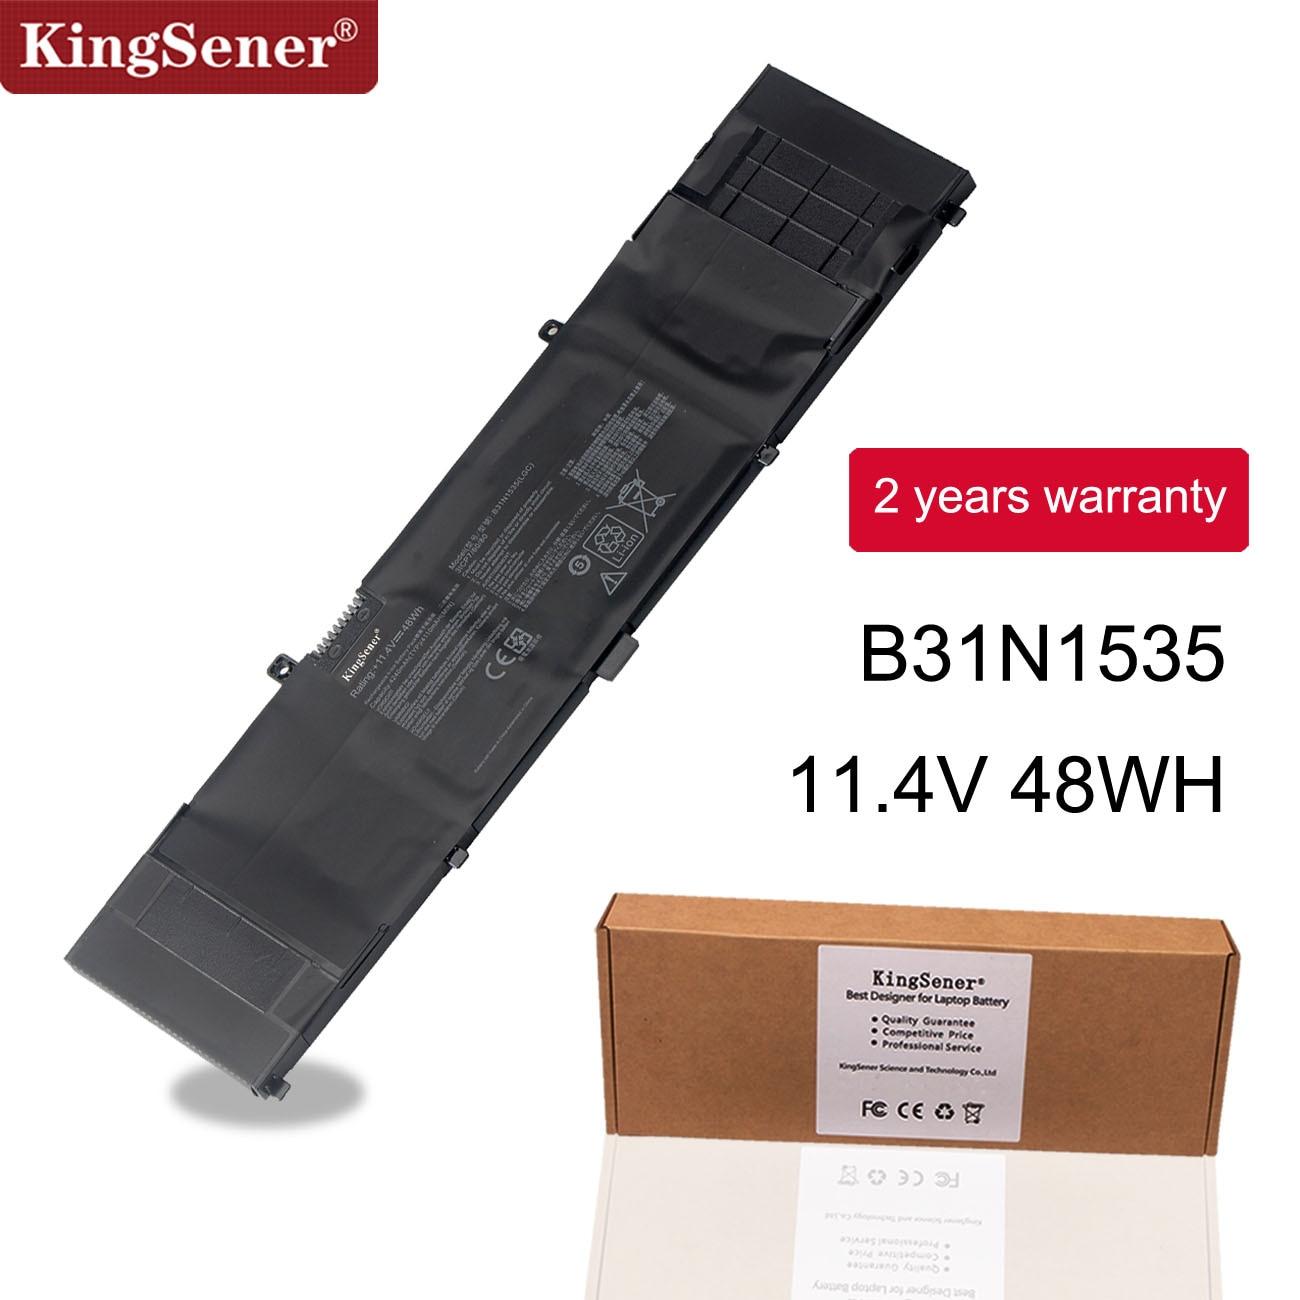 Kingsener B31N1535 Laptop Battery For ASUS ZenBook UX310 UX310UA UX310UQ UX410 UX410UA UX410UQ U4000U U400UQ RX310U 11.4V 48WH